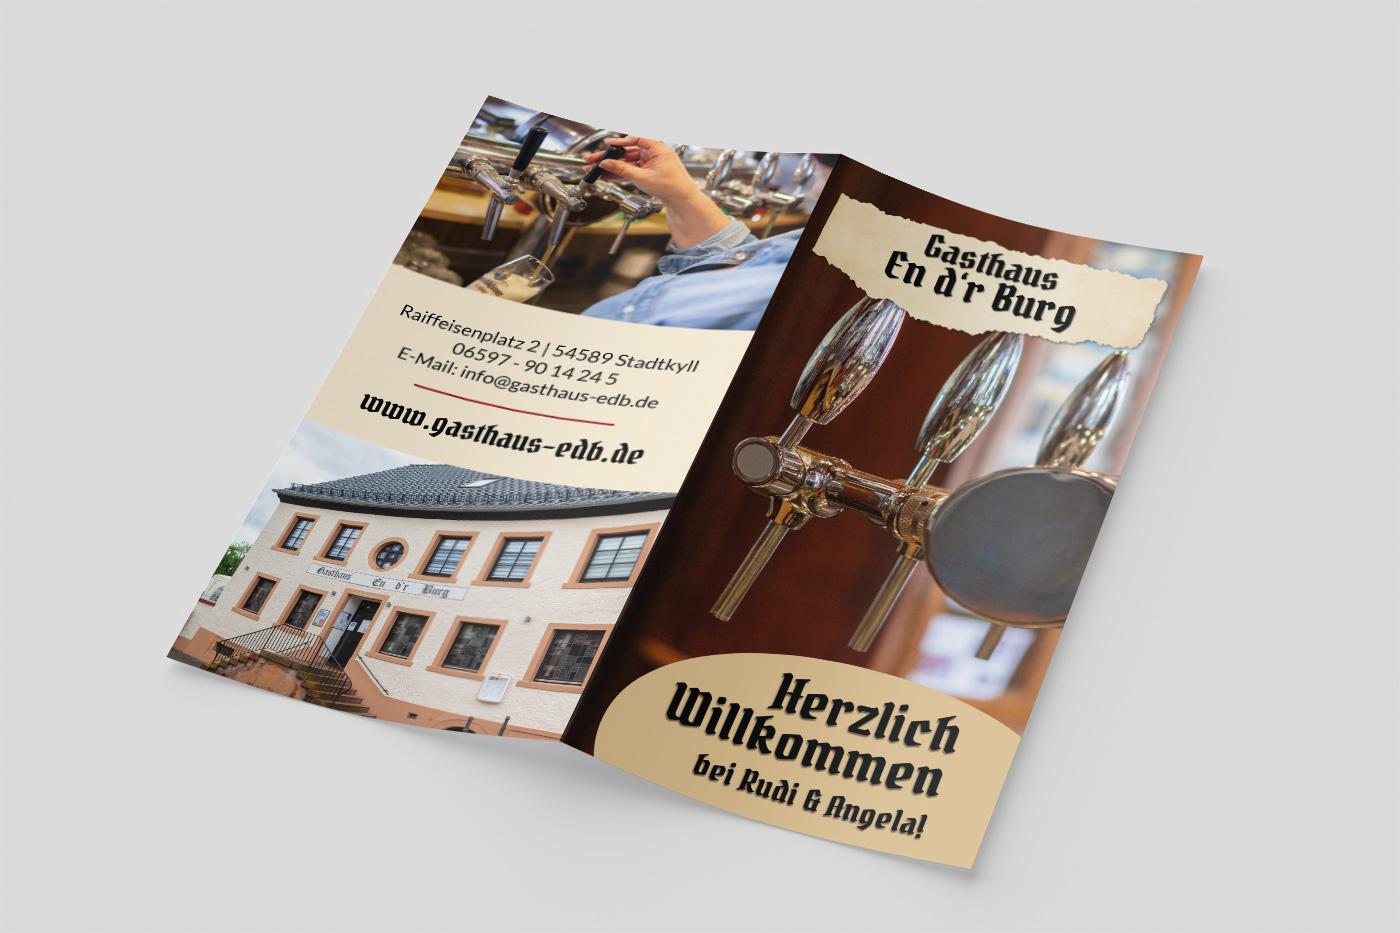 Flyer Gasthaus En d'r Burg